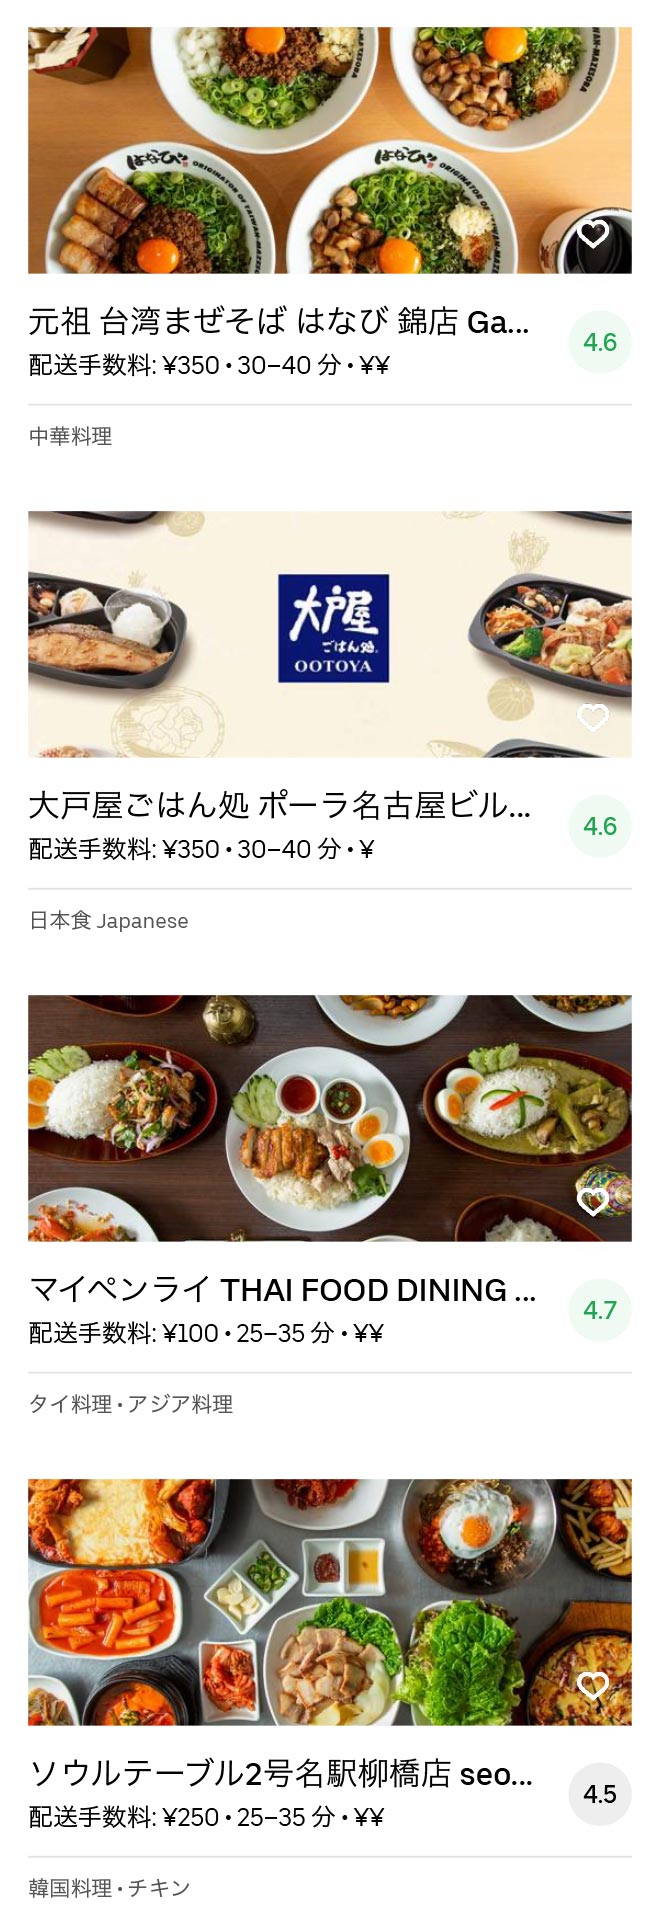 Nagoya nakamura menu 2005 08